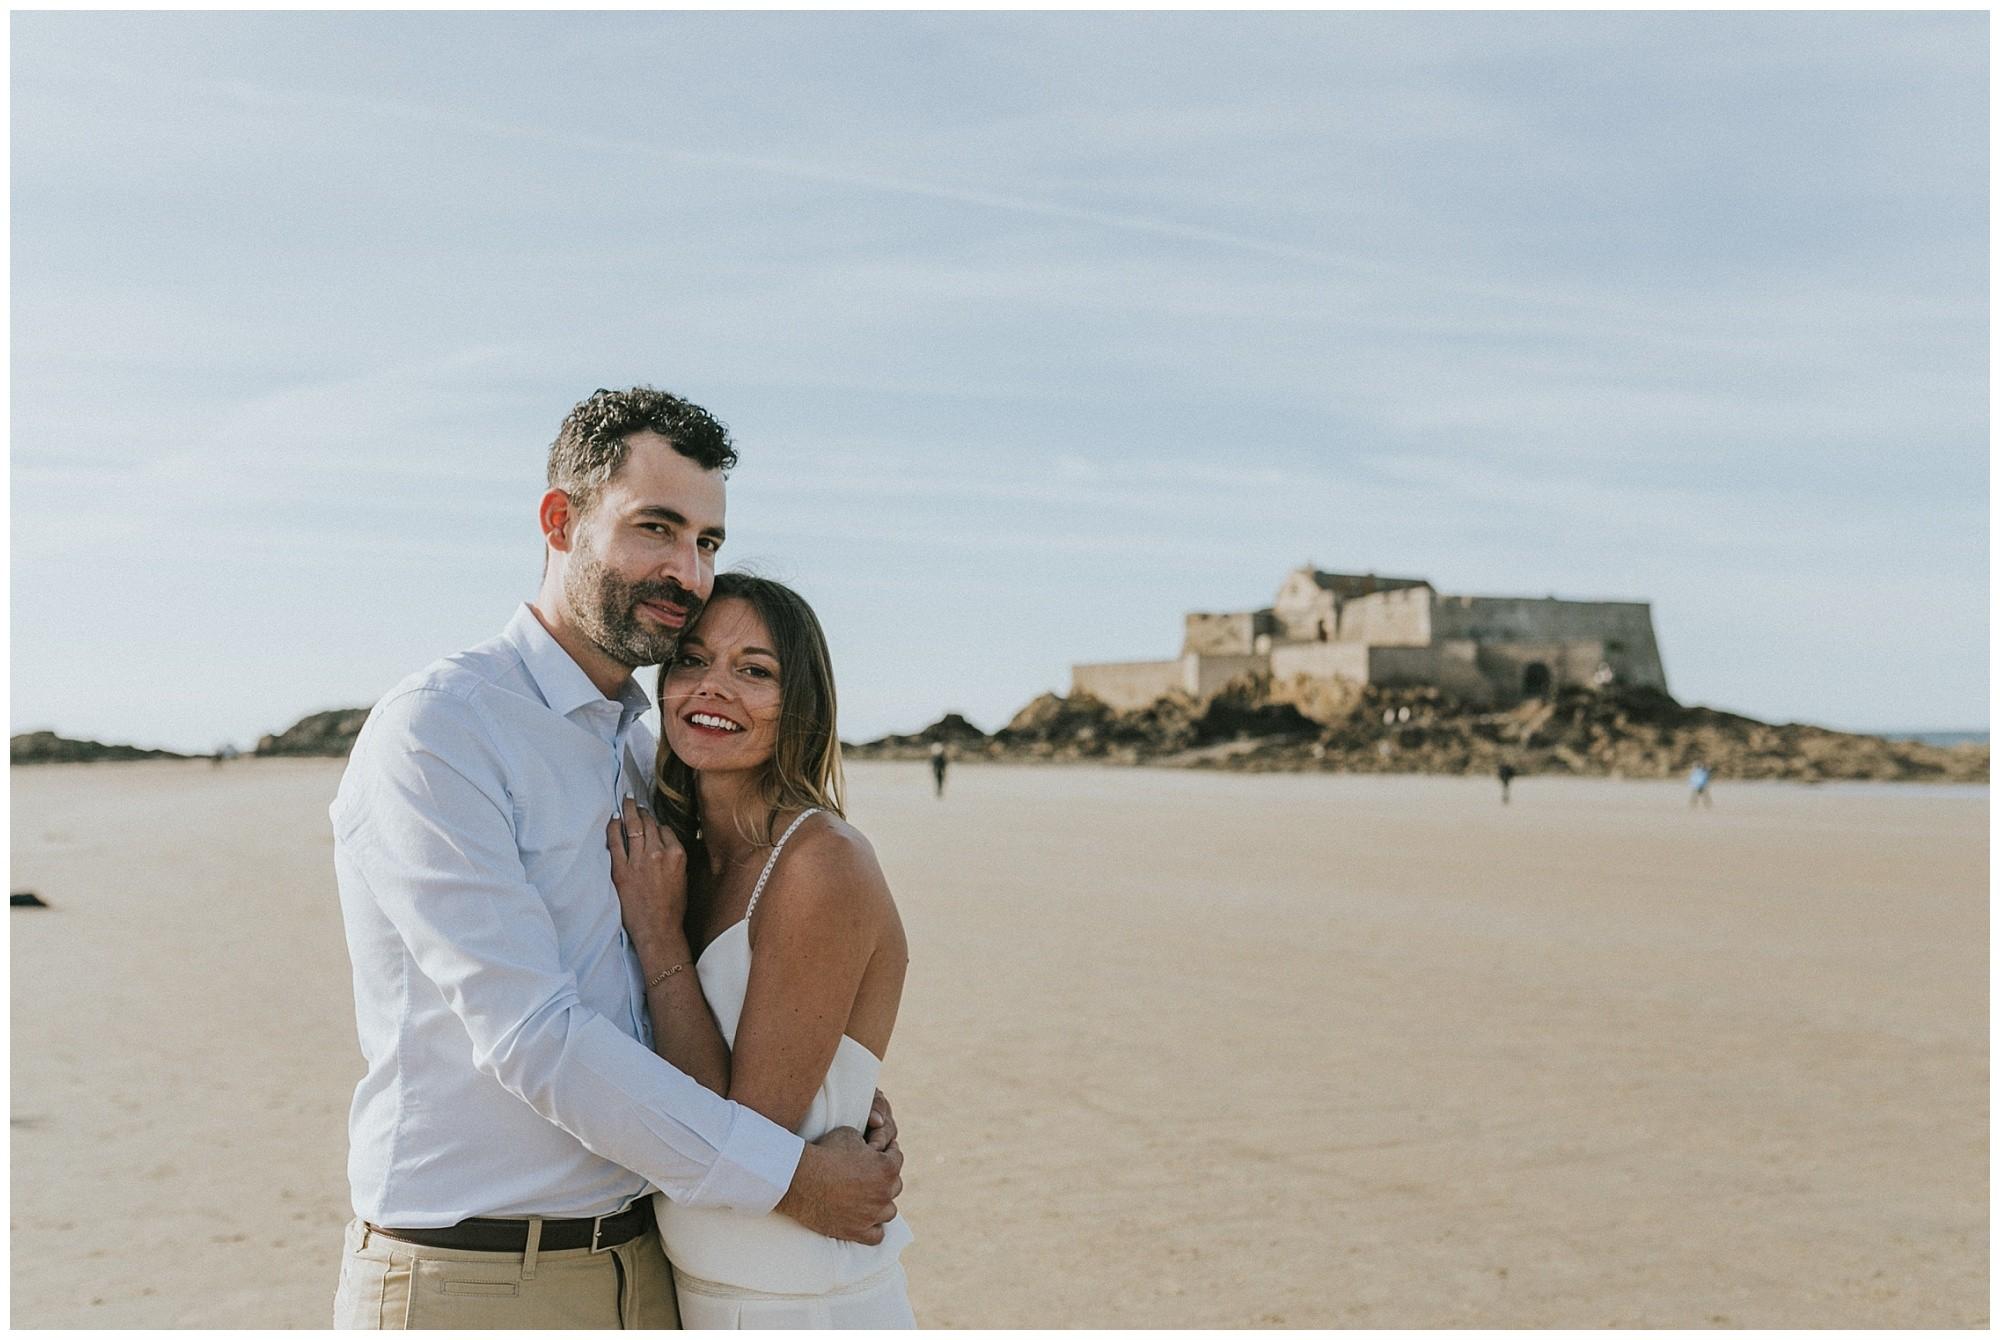 Kateryna-photos-photographe-mariage-bretagne-saint-malo-finistere-cotes-darmor-wedding_0064.jpg